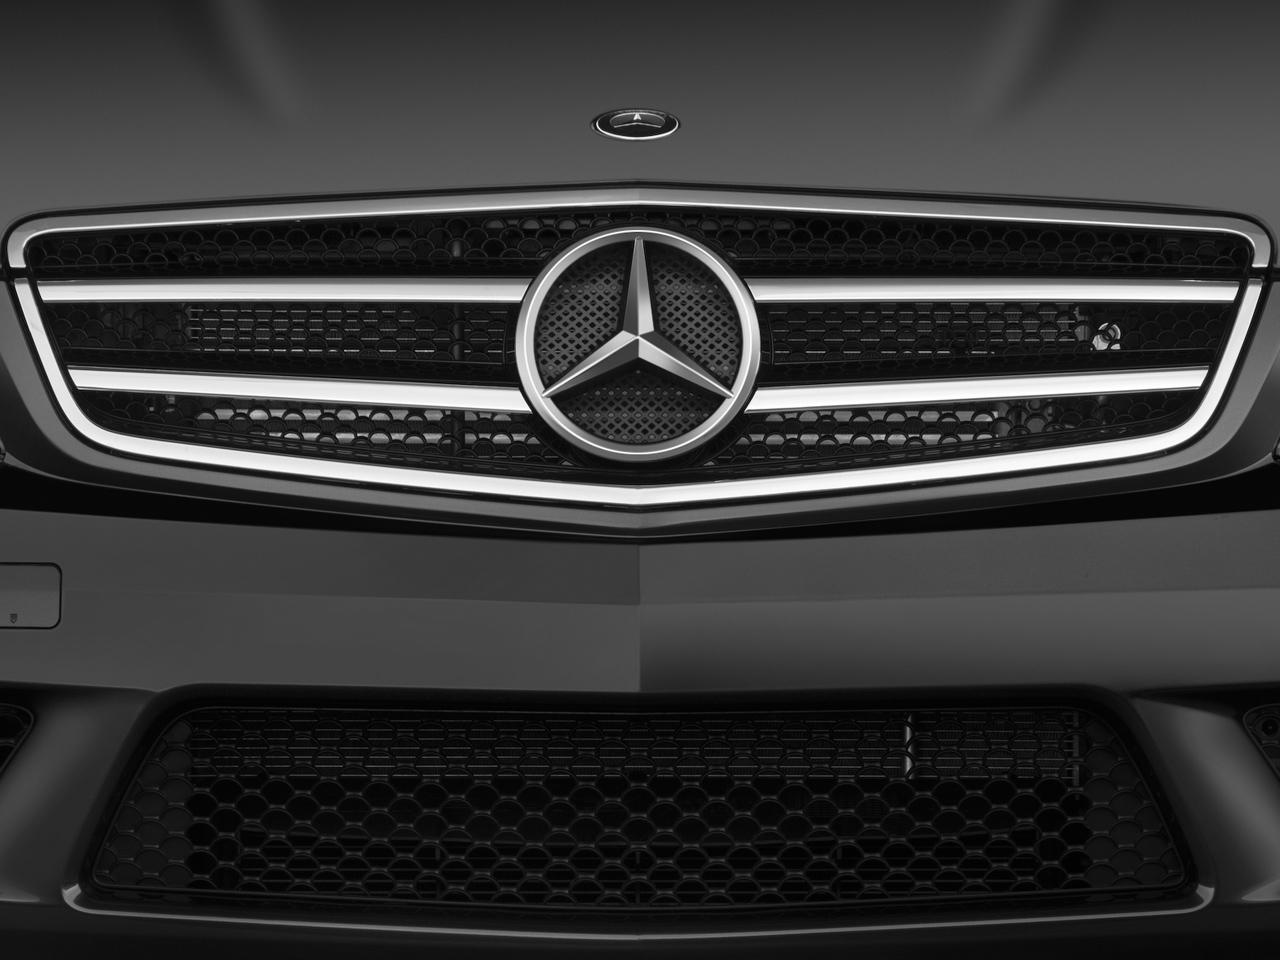 2009 mercedes benz c300 mercedes benz luxury sedan for Mercedes benz c300 grill